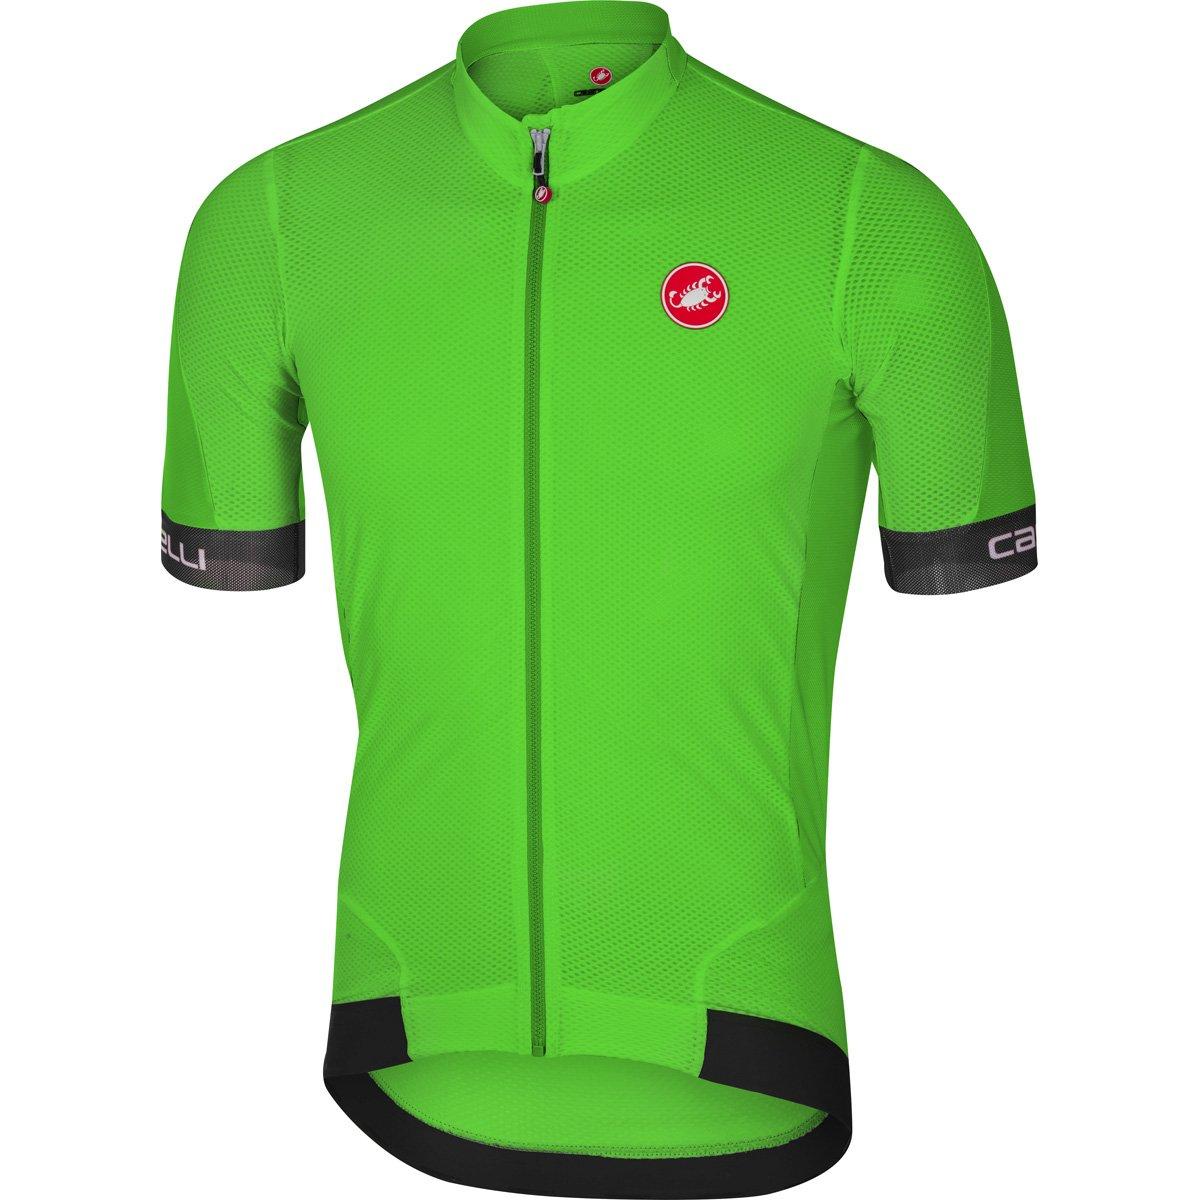 CastelliメンズVolata 2 Bike jersey fz B06XCYFVGF Medium Pro Green/Black Pro Green/Black Medium